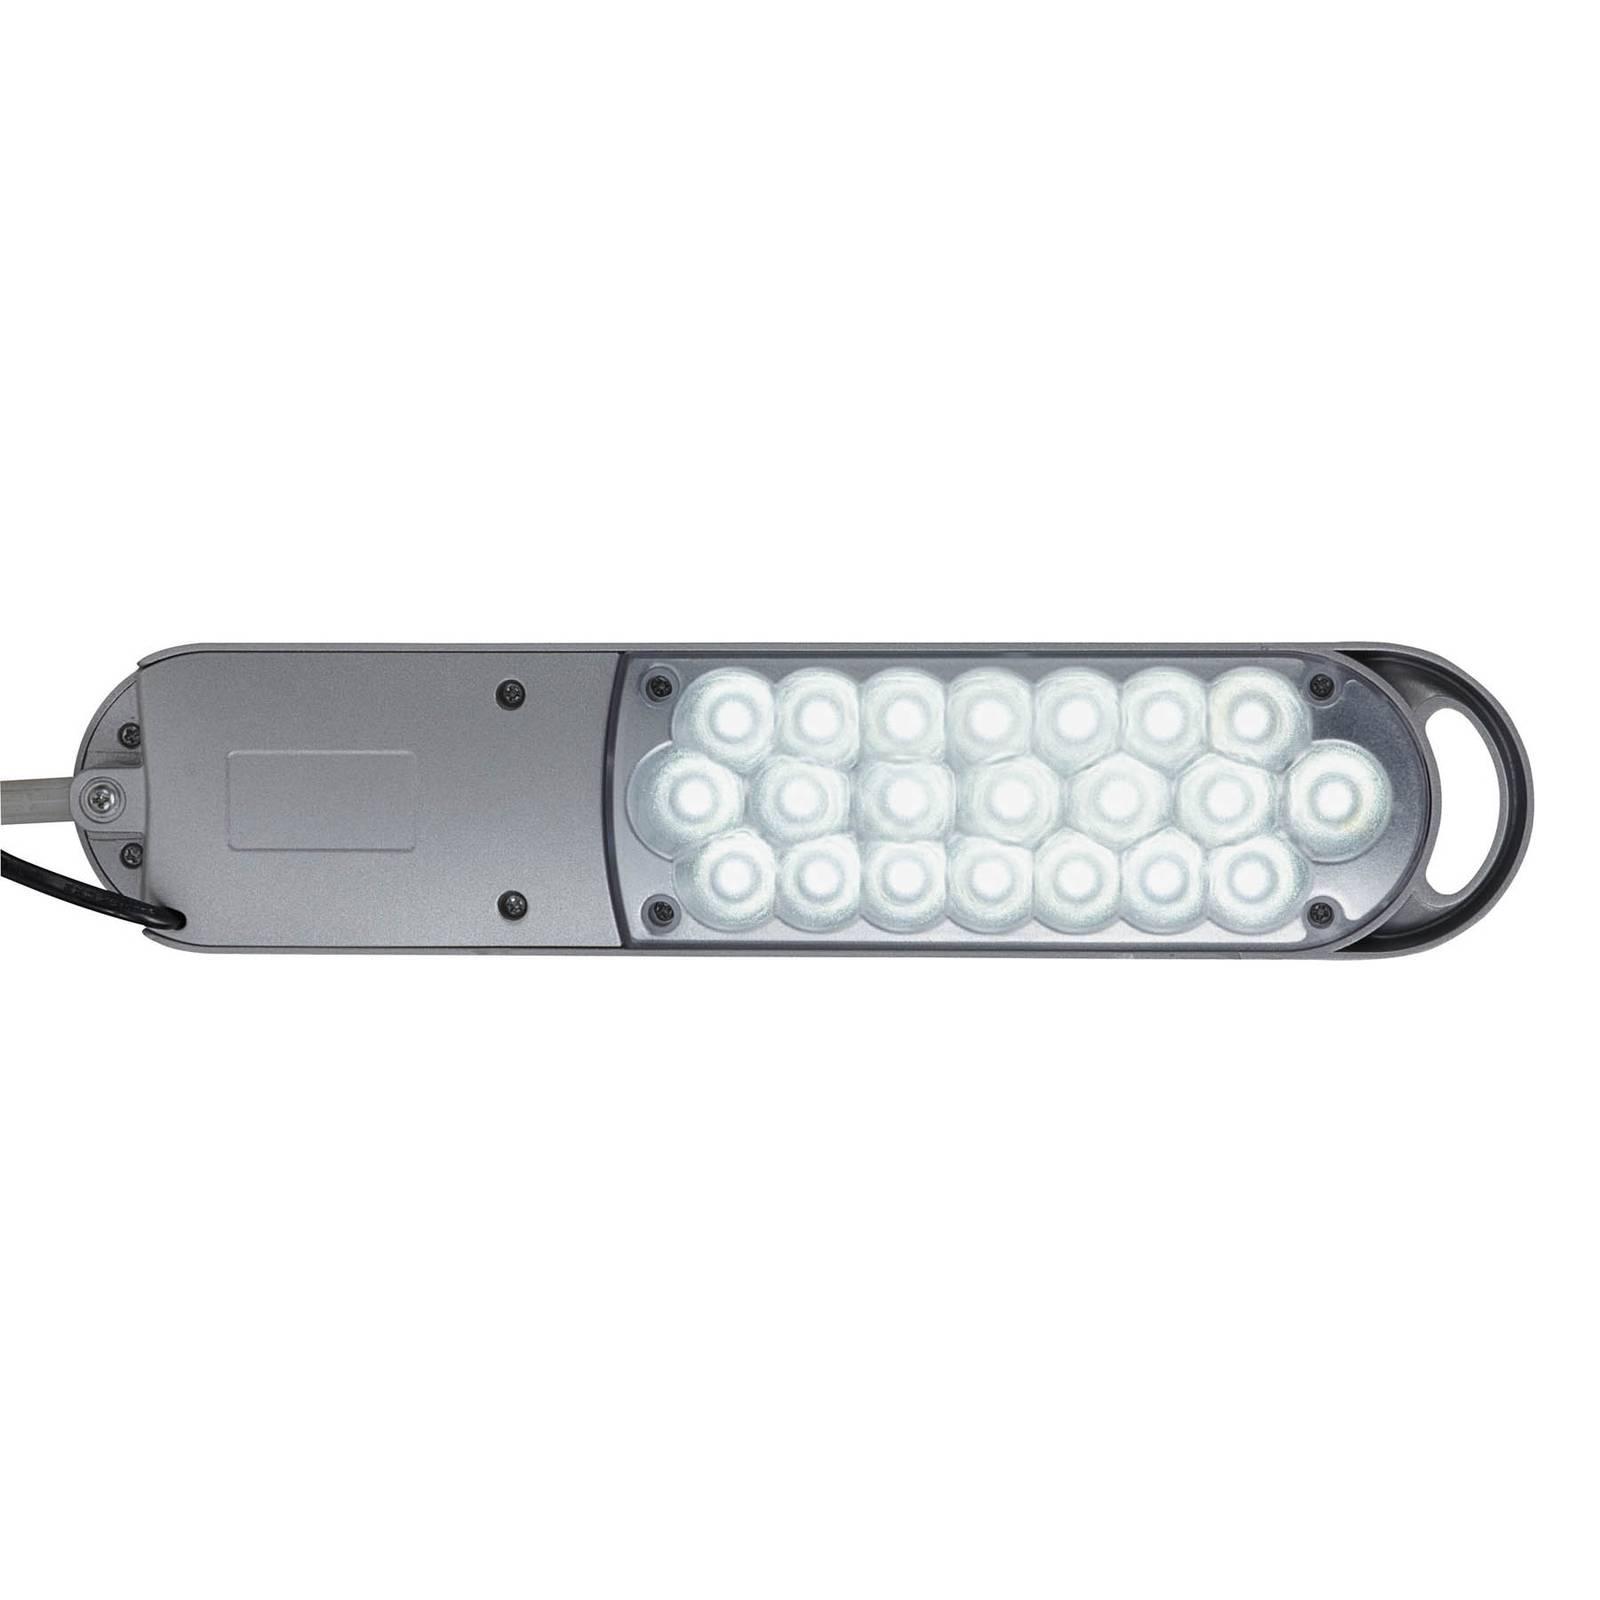 LED-pöytävalaisin Atlantic, jalusta, hopea